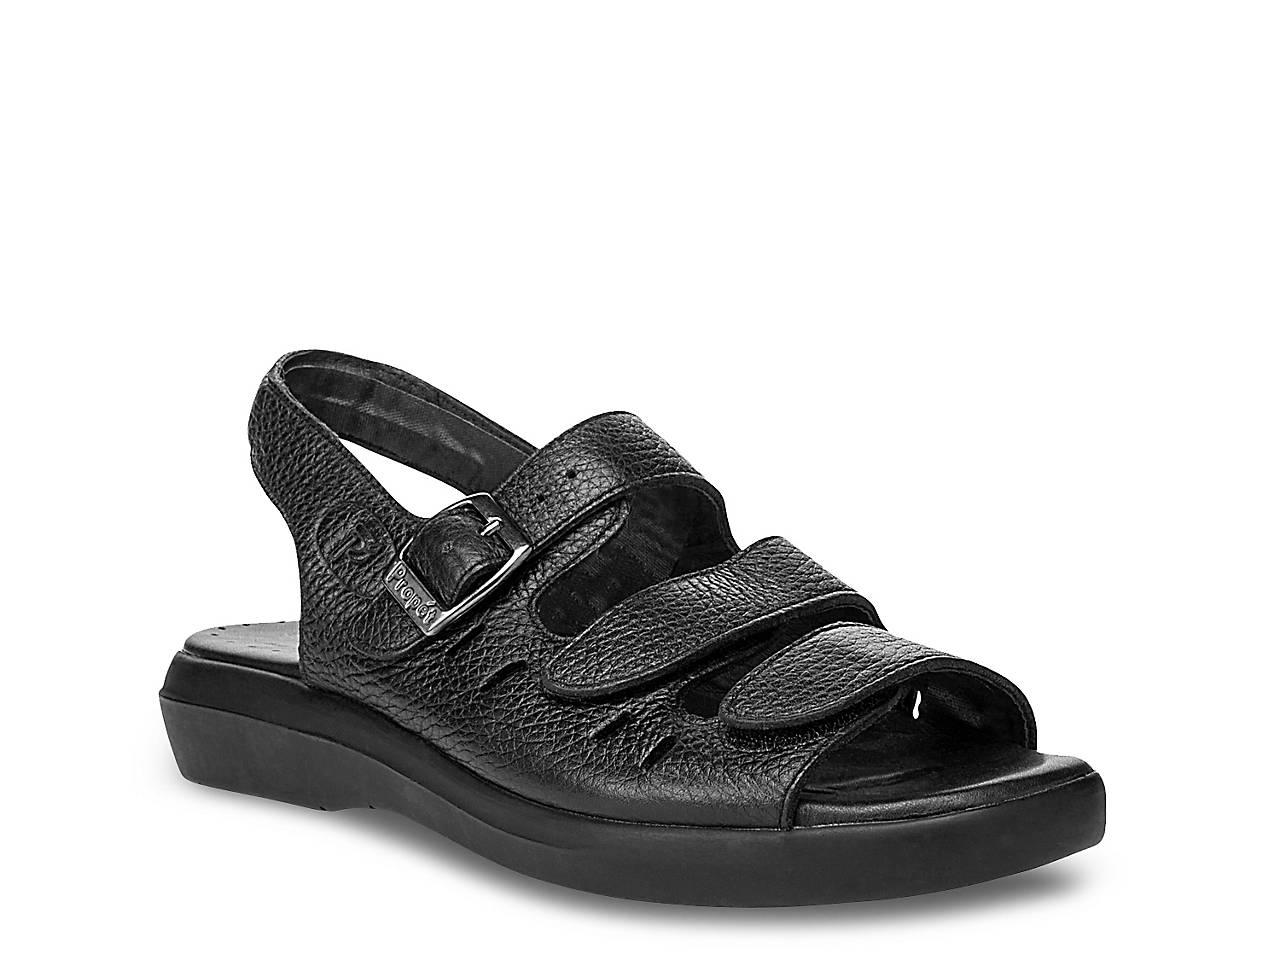 a4d7cf1b3c79 Propet Breeze Walker Sport Sandal Women s Shoes